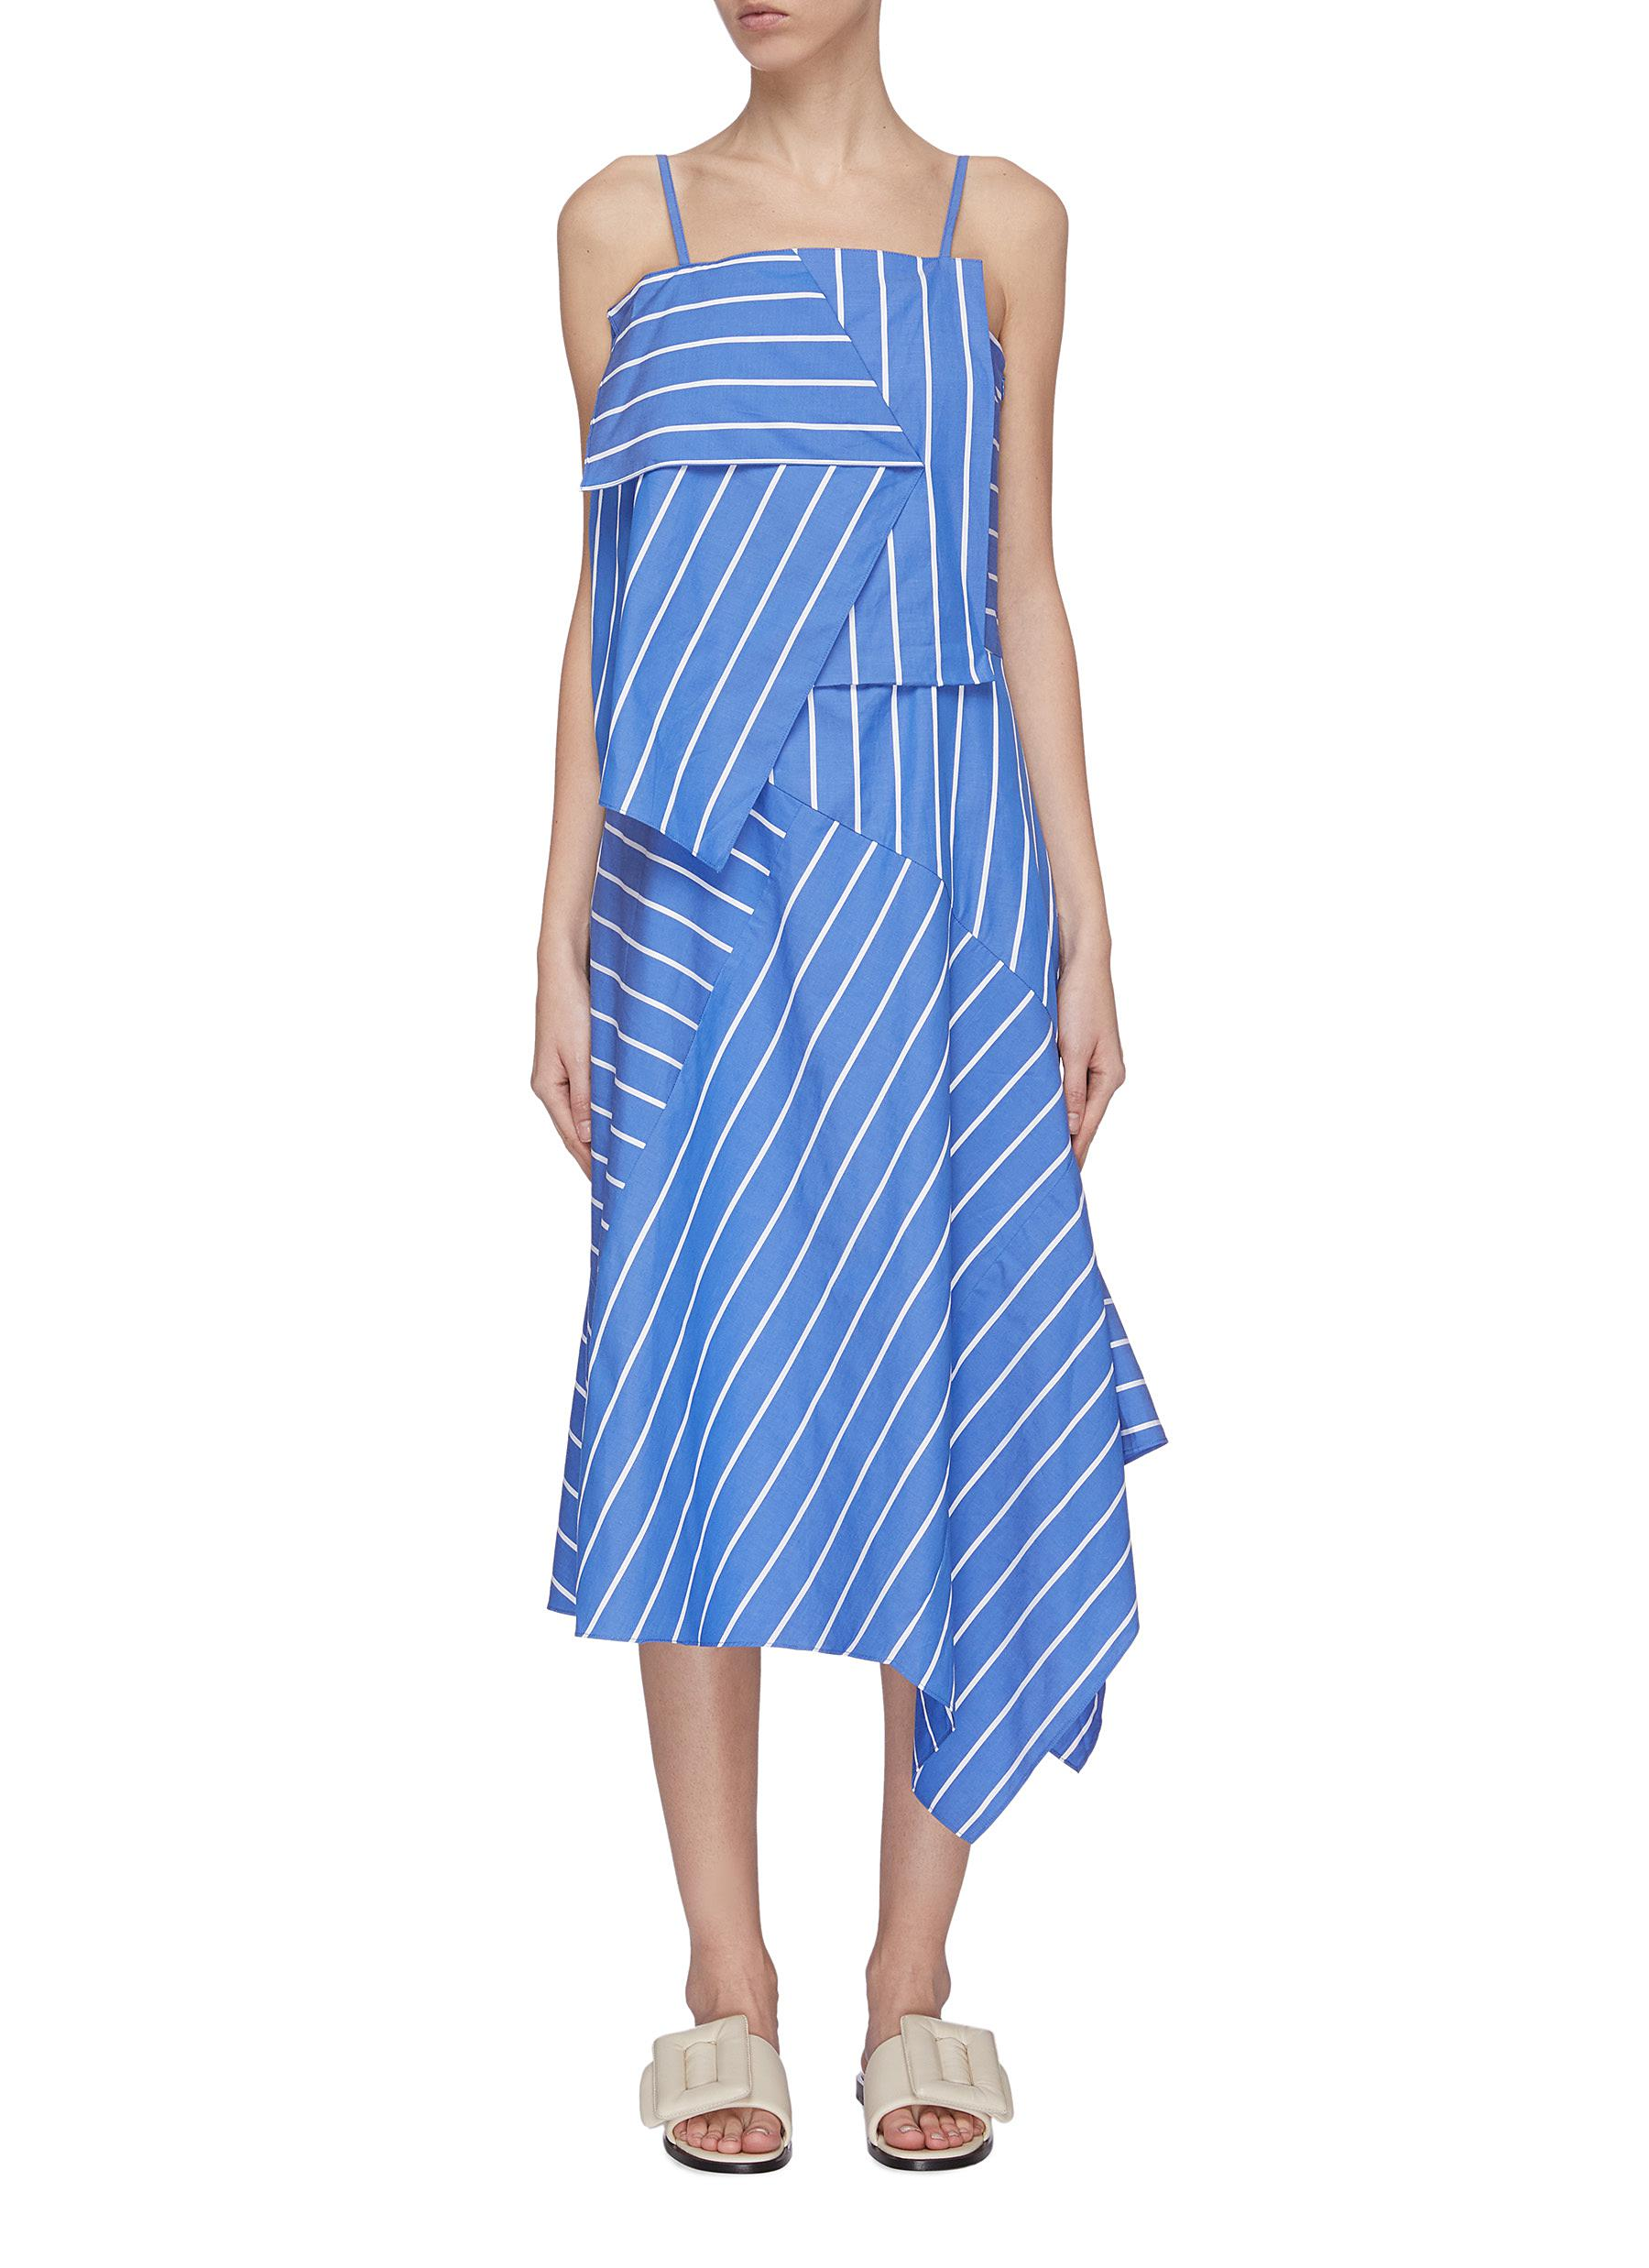 Buy Ffixxed Studios Dresses Asymmetric stripe panel dress